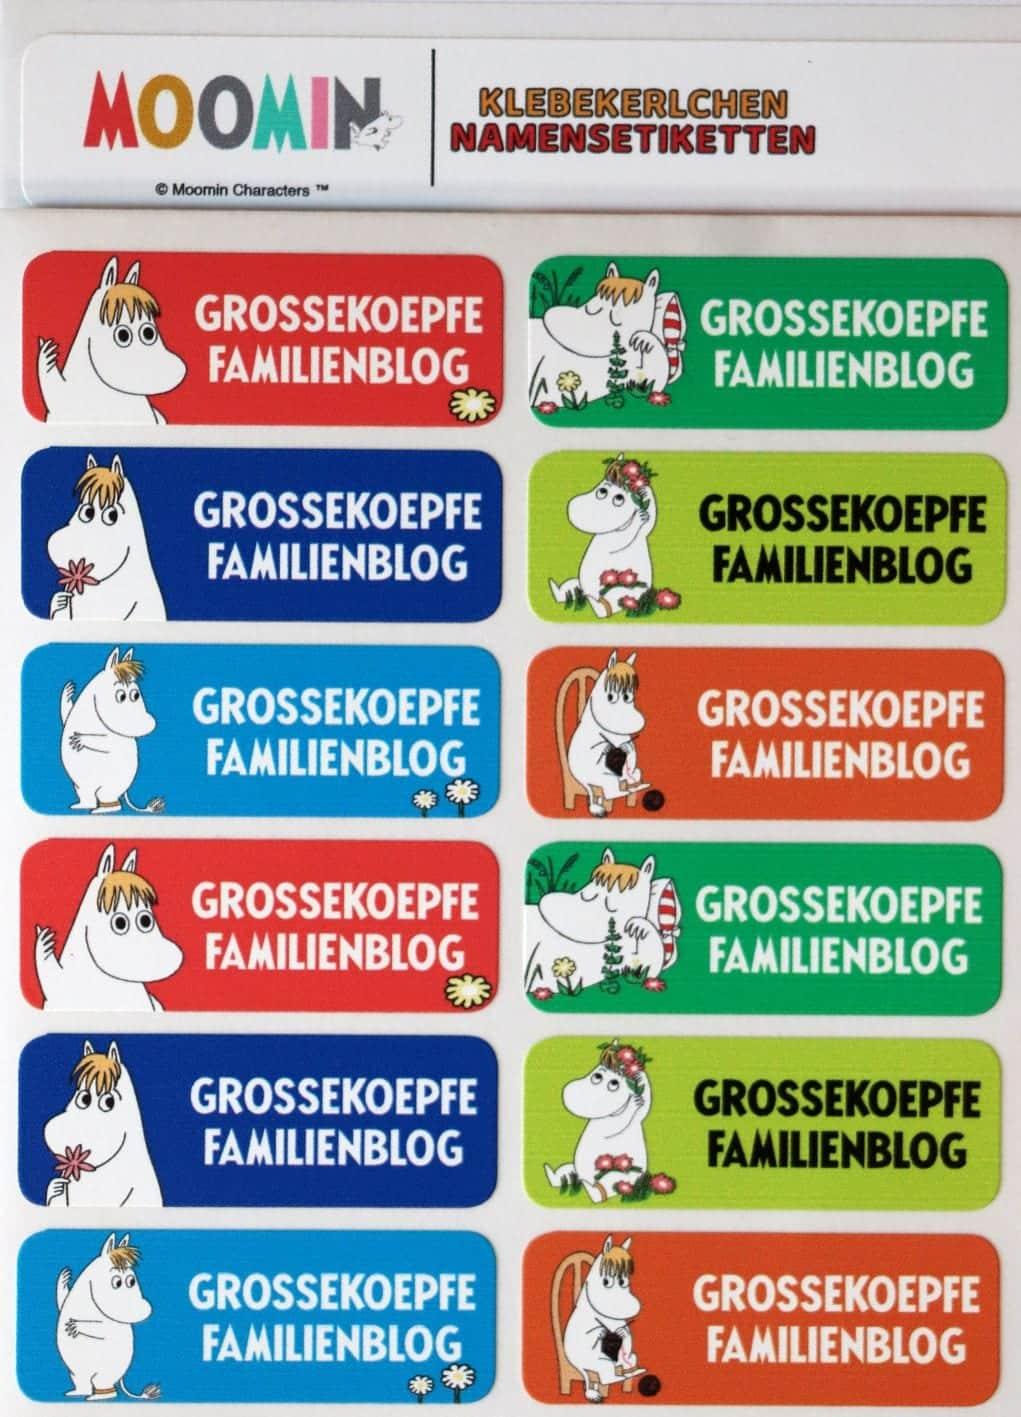 Namensetiketten_Klebekerlchen/grossekoepfe.de